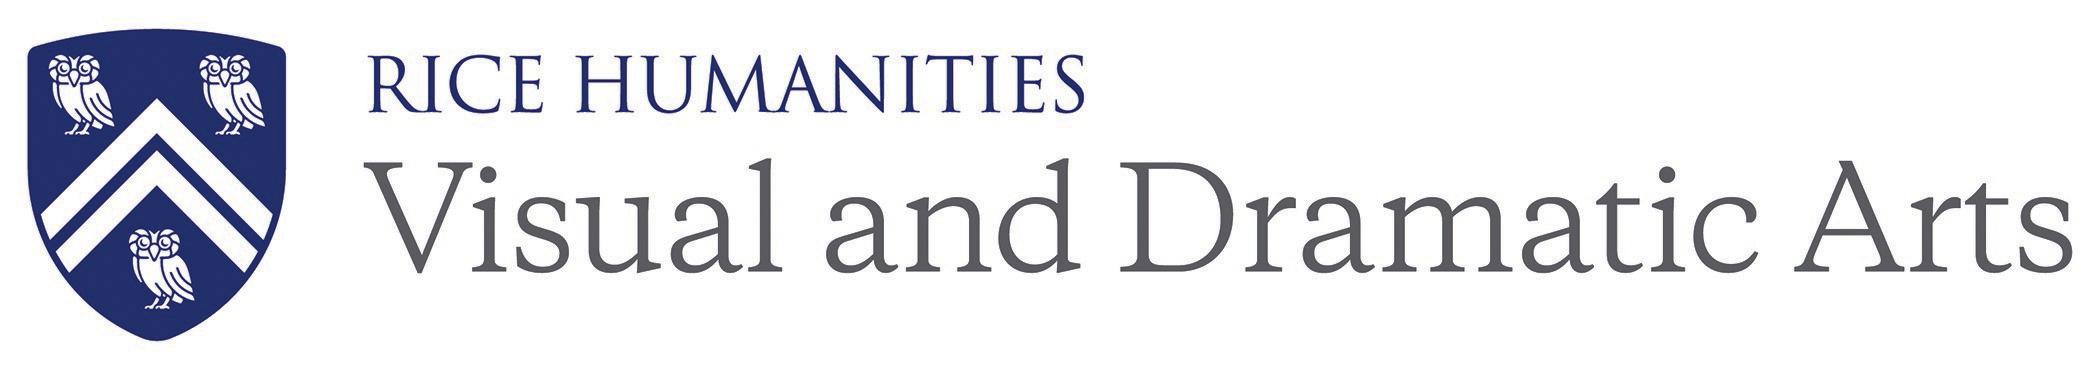 Department of Visual and Dramatic Arts Logo